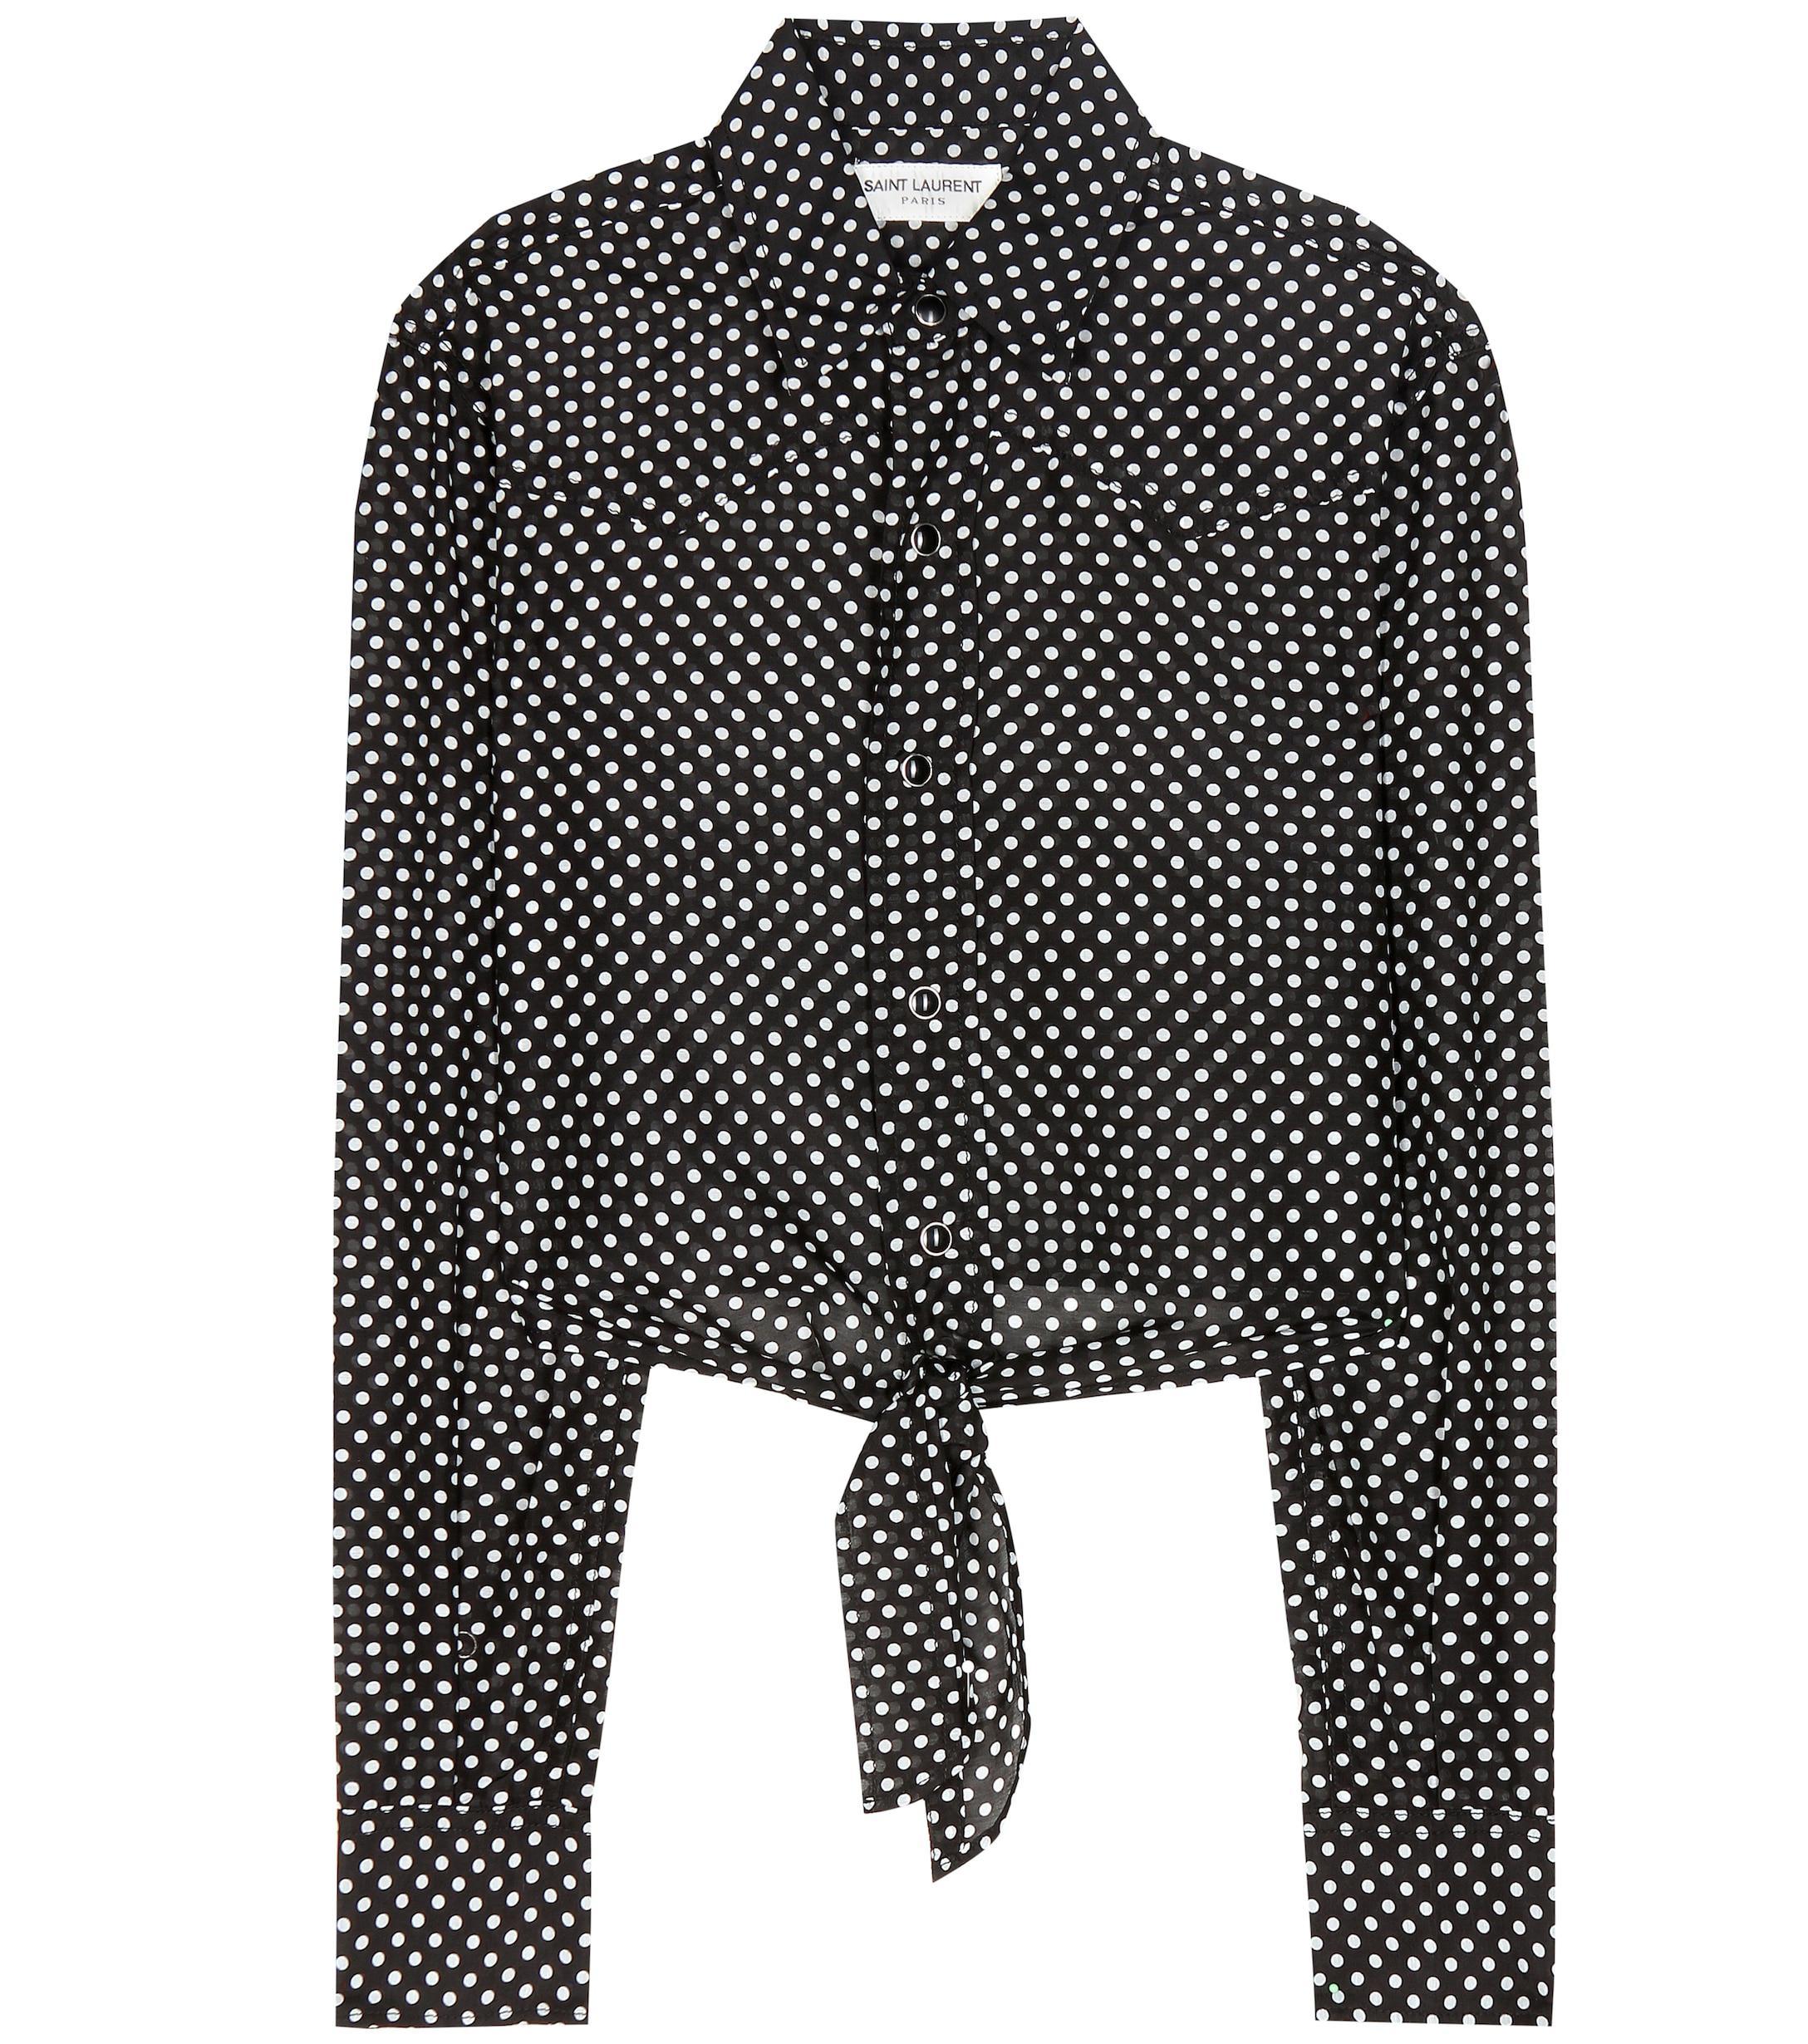 89271b18f9a99a Saint Laurent Cropped Polka-dot Shirt in Black - Lyst